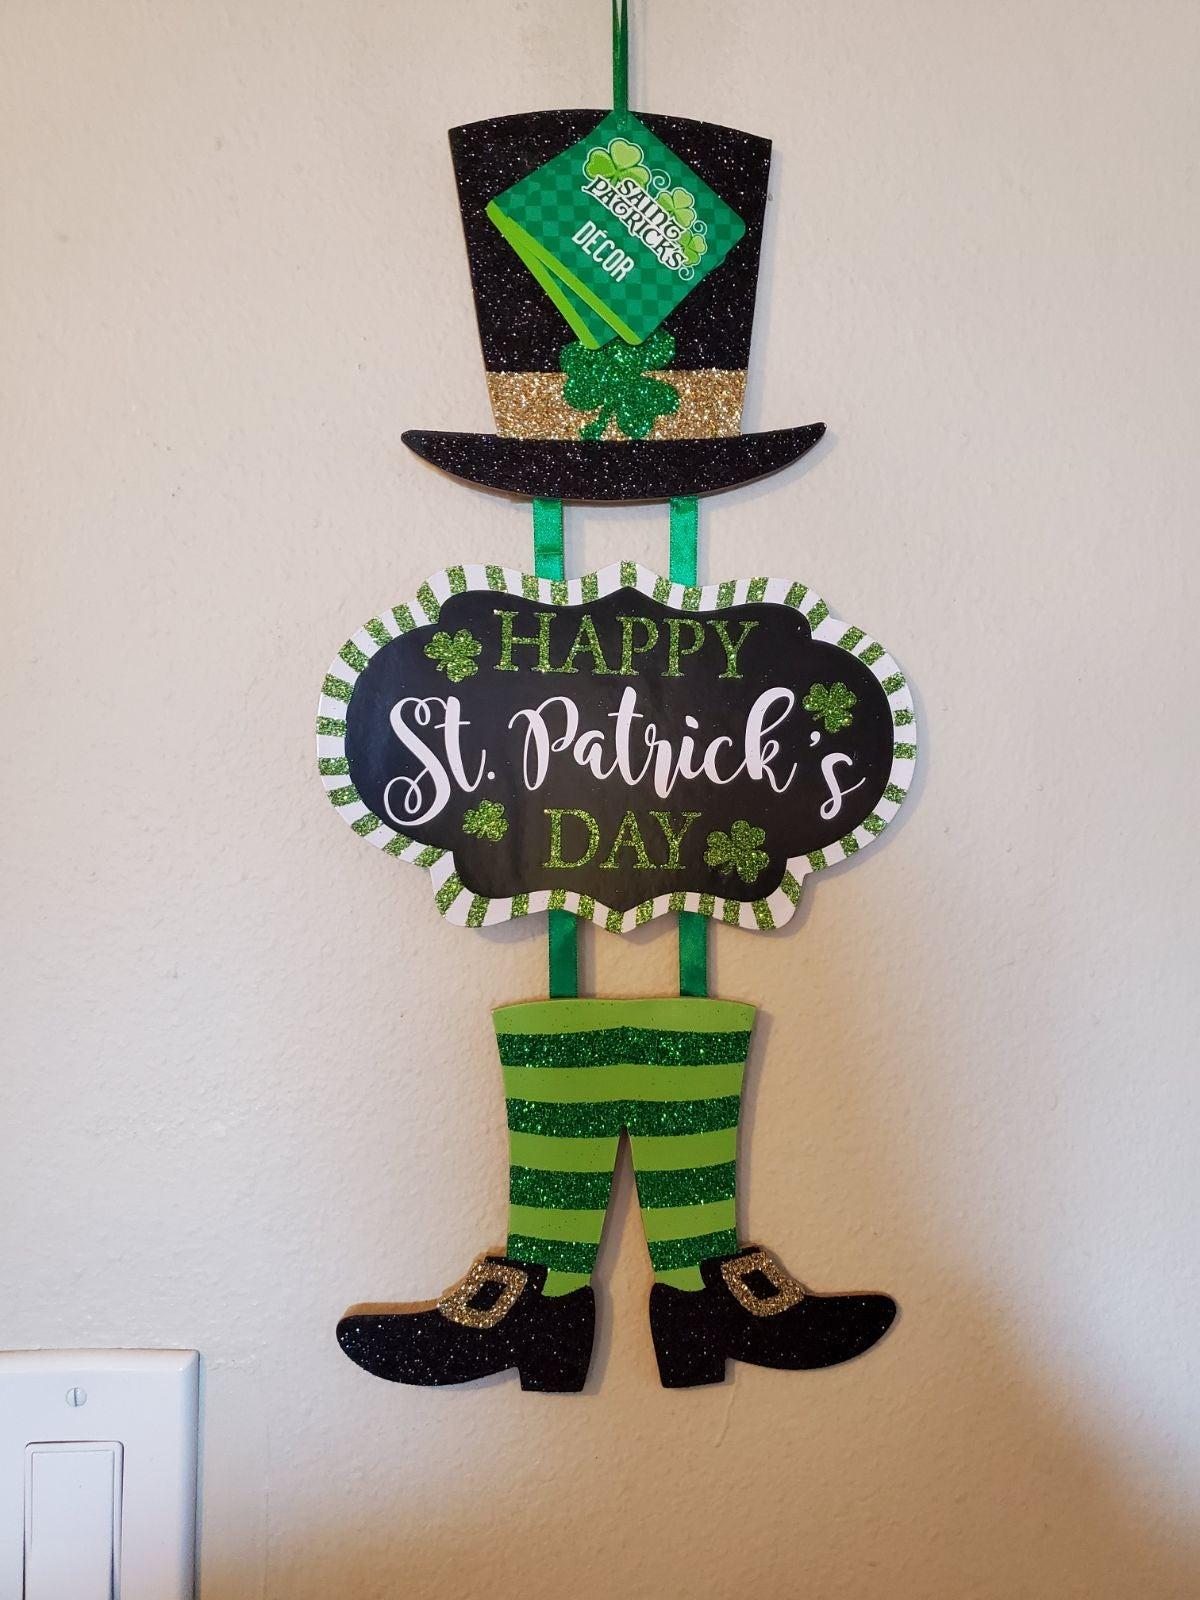 St Patrick's Day Decoration